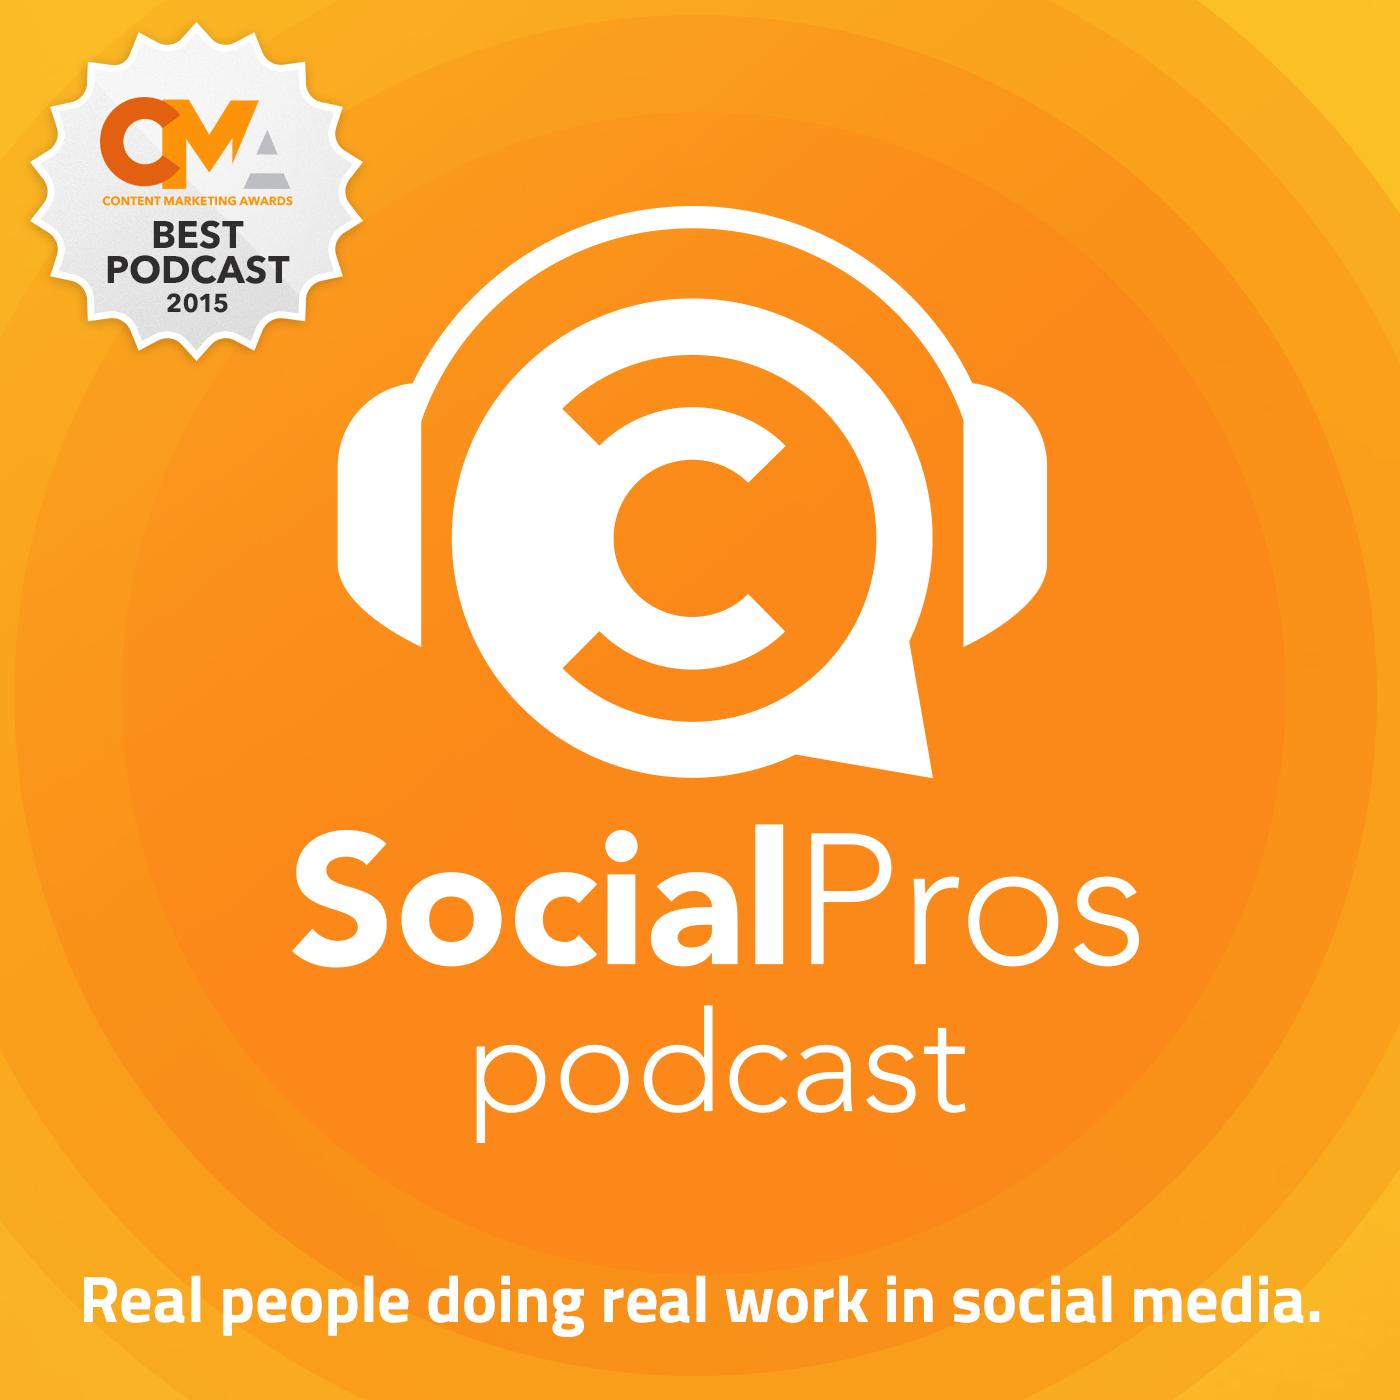 social-pros-podcast